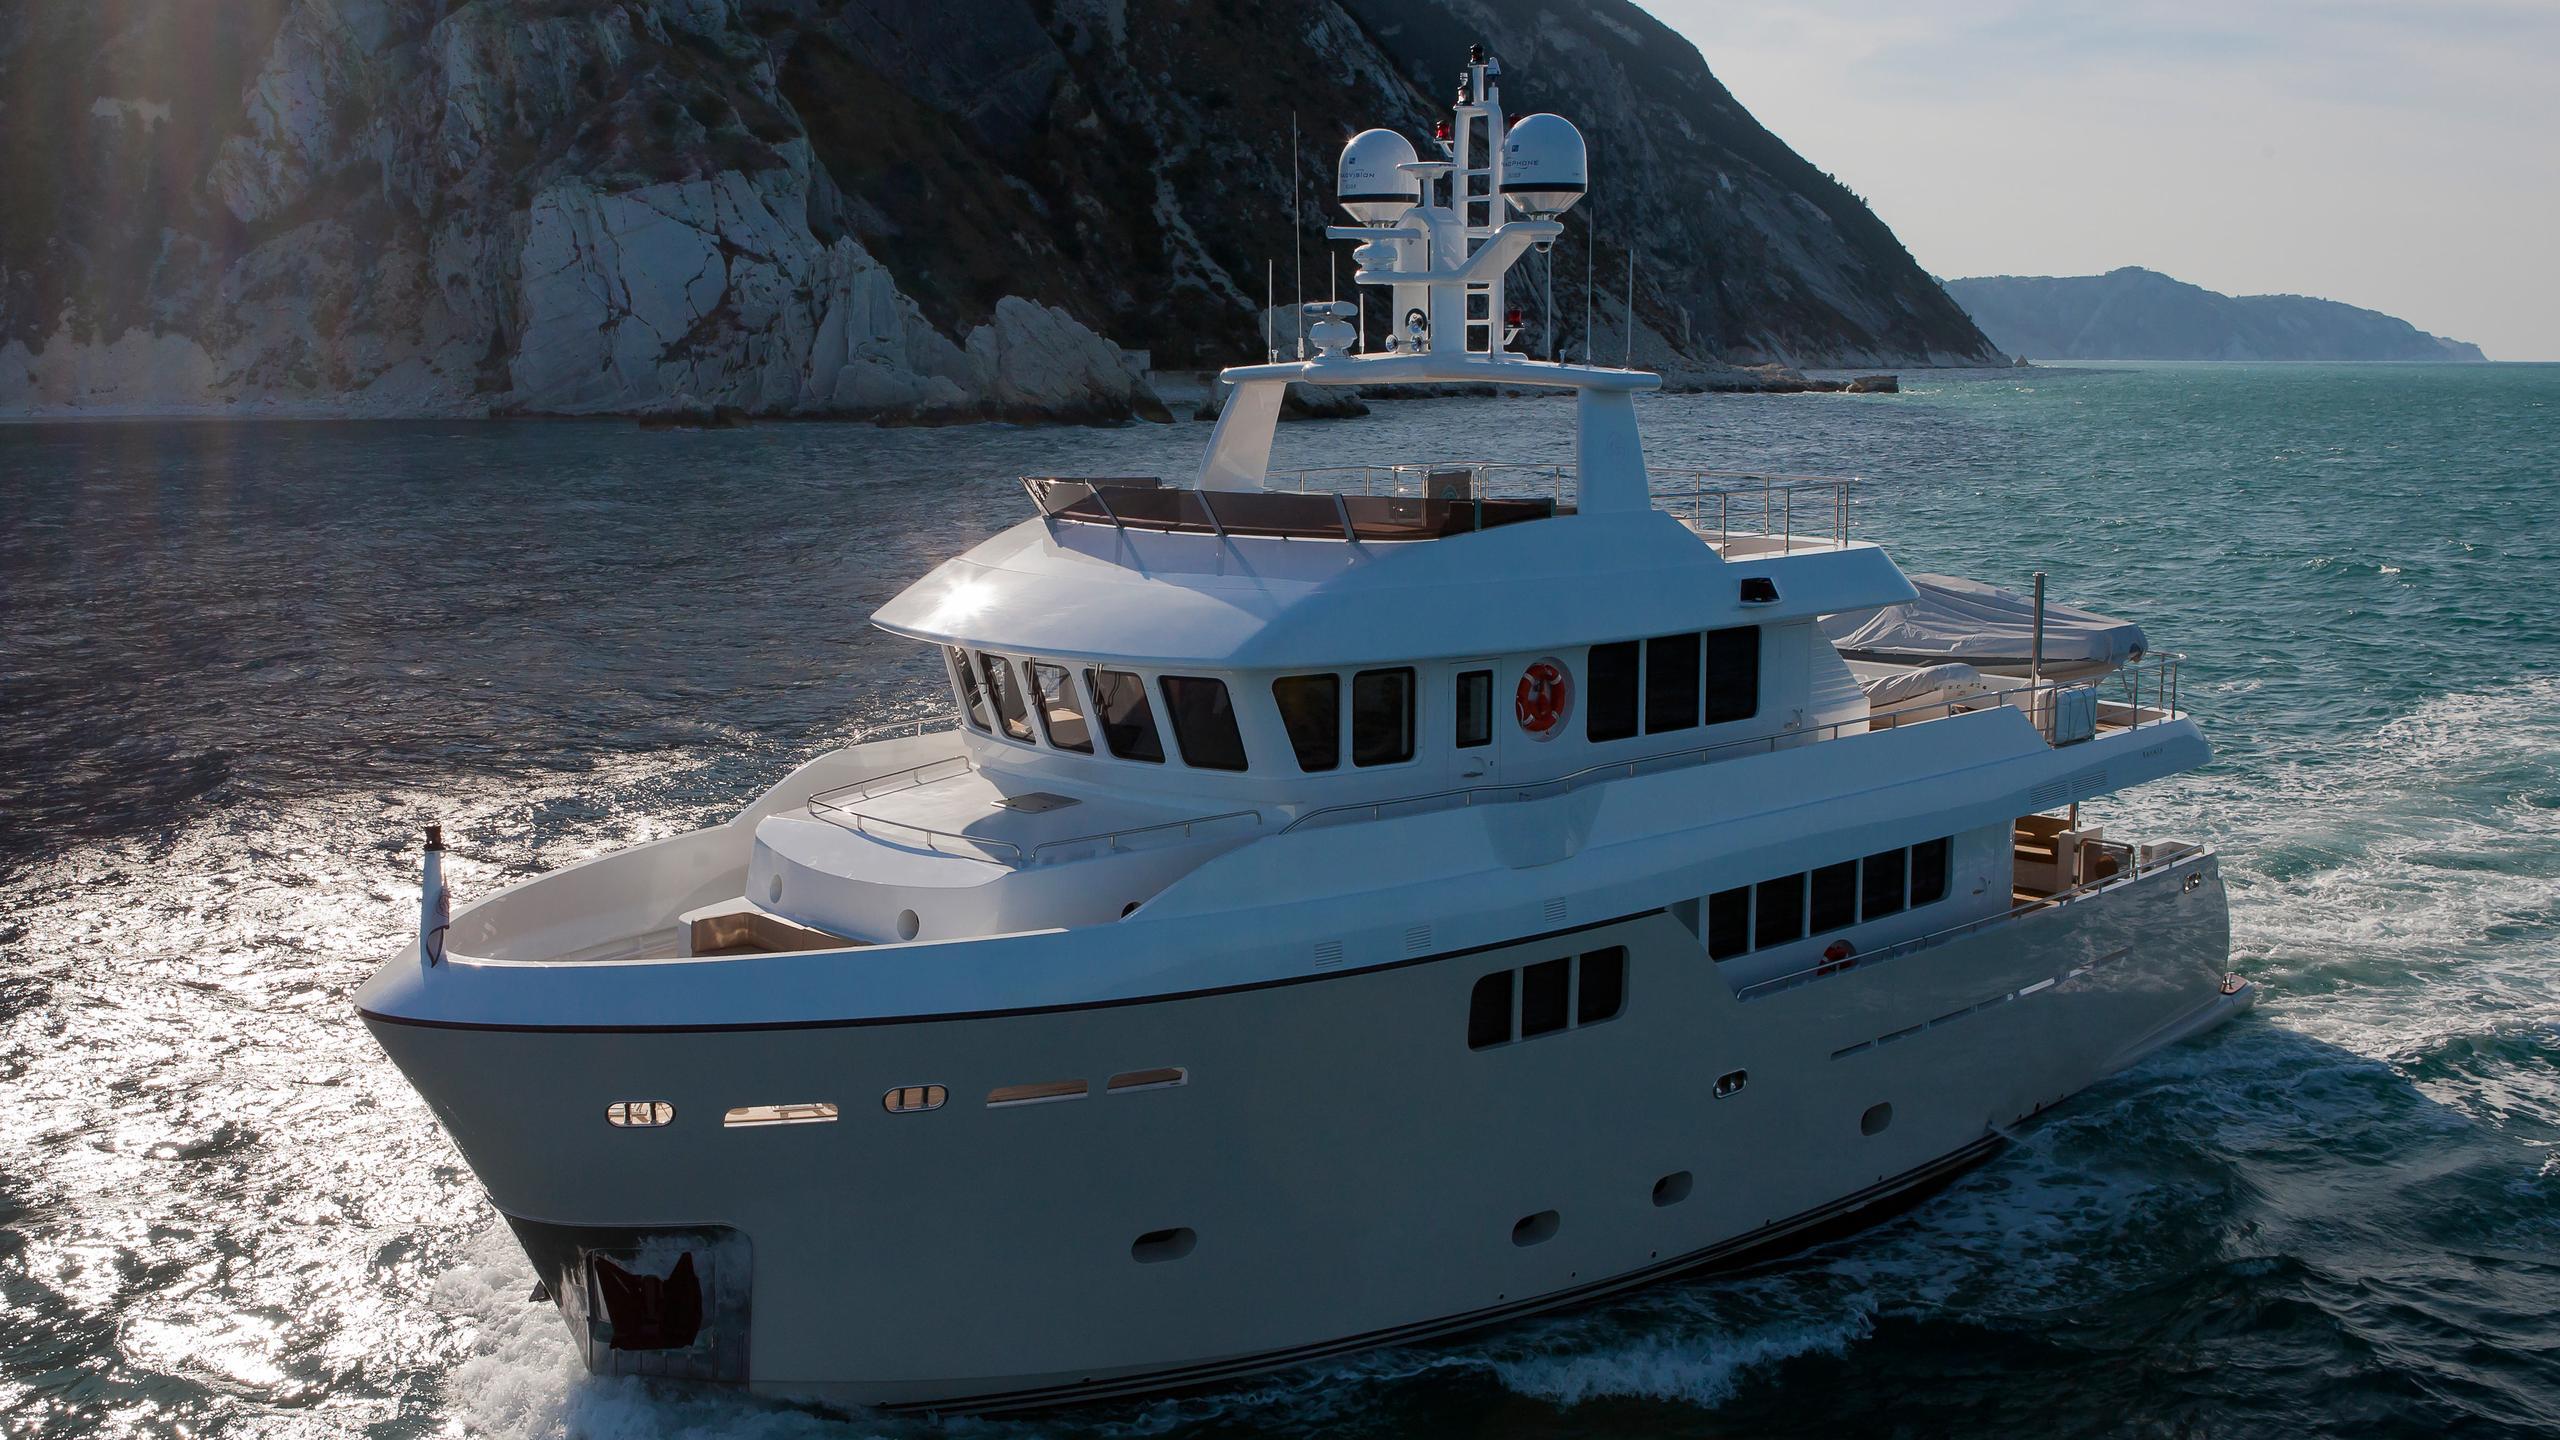 percheron-motor-yacht-cantiere-delle-marche-darwin-86-2012-26m-bow